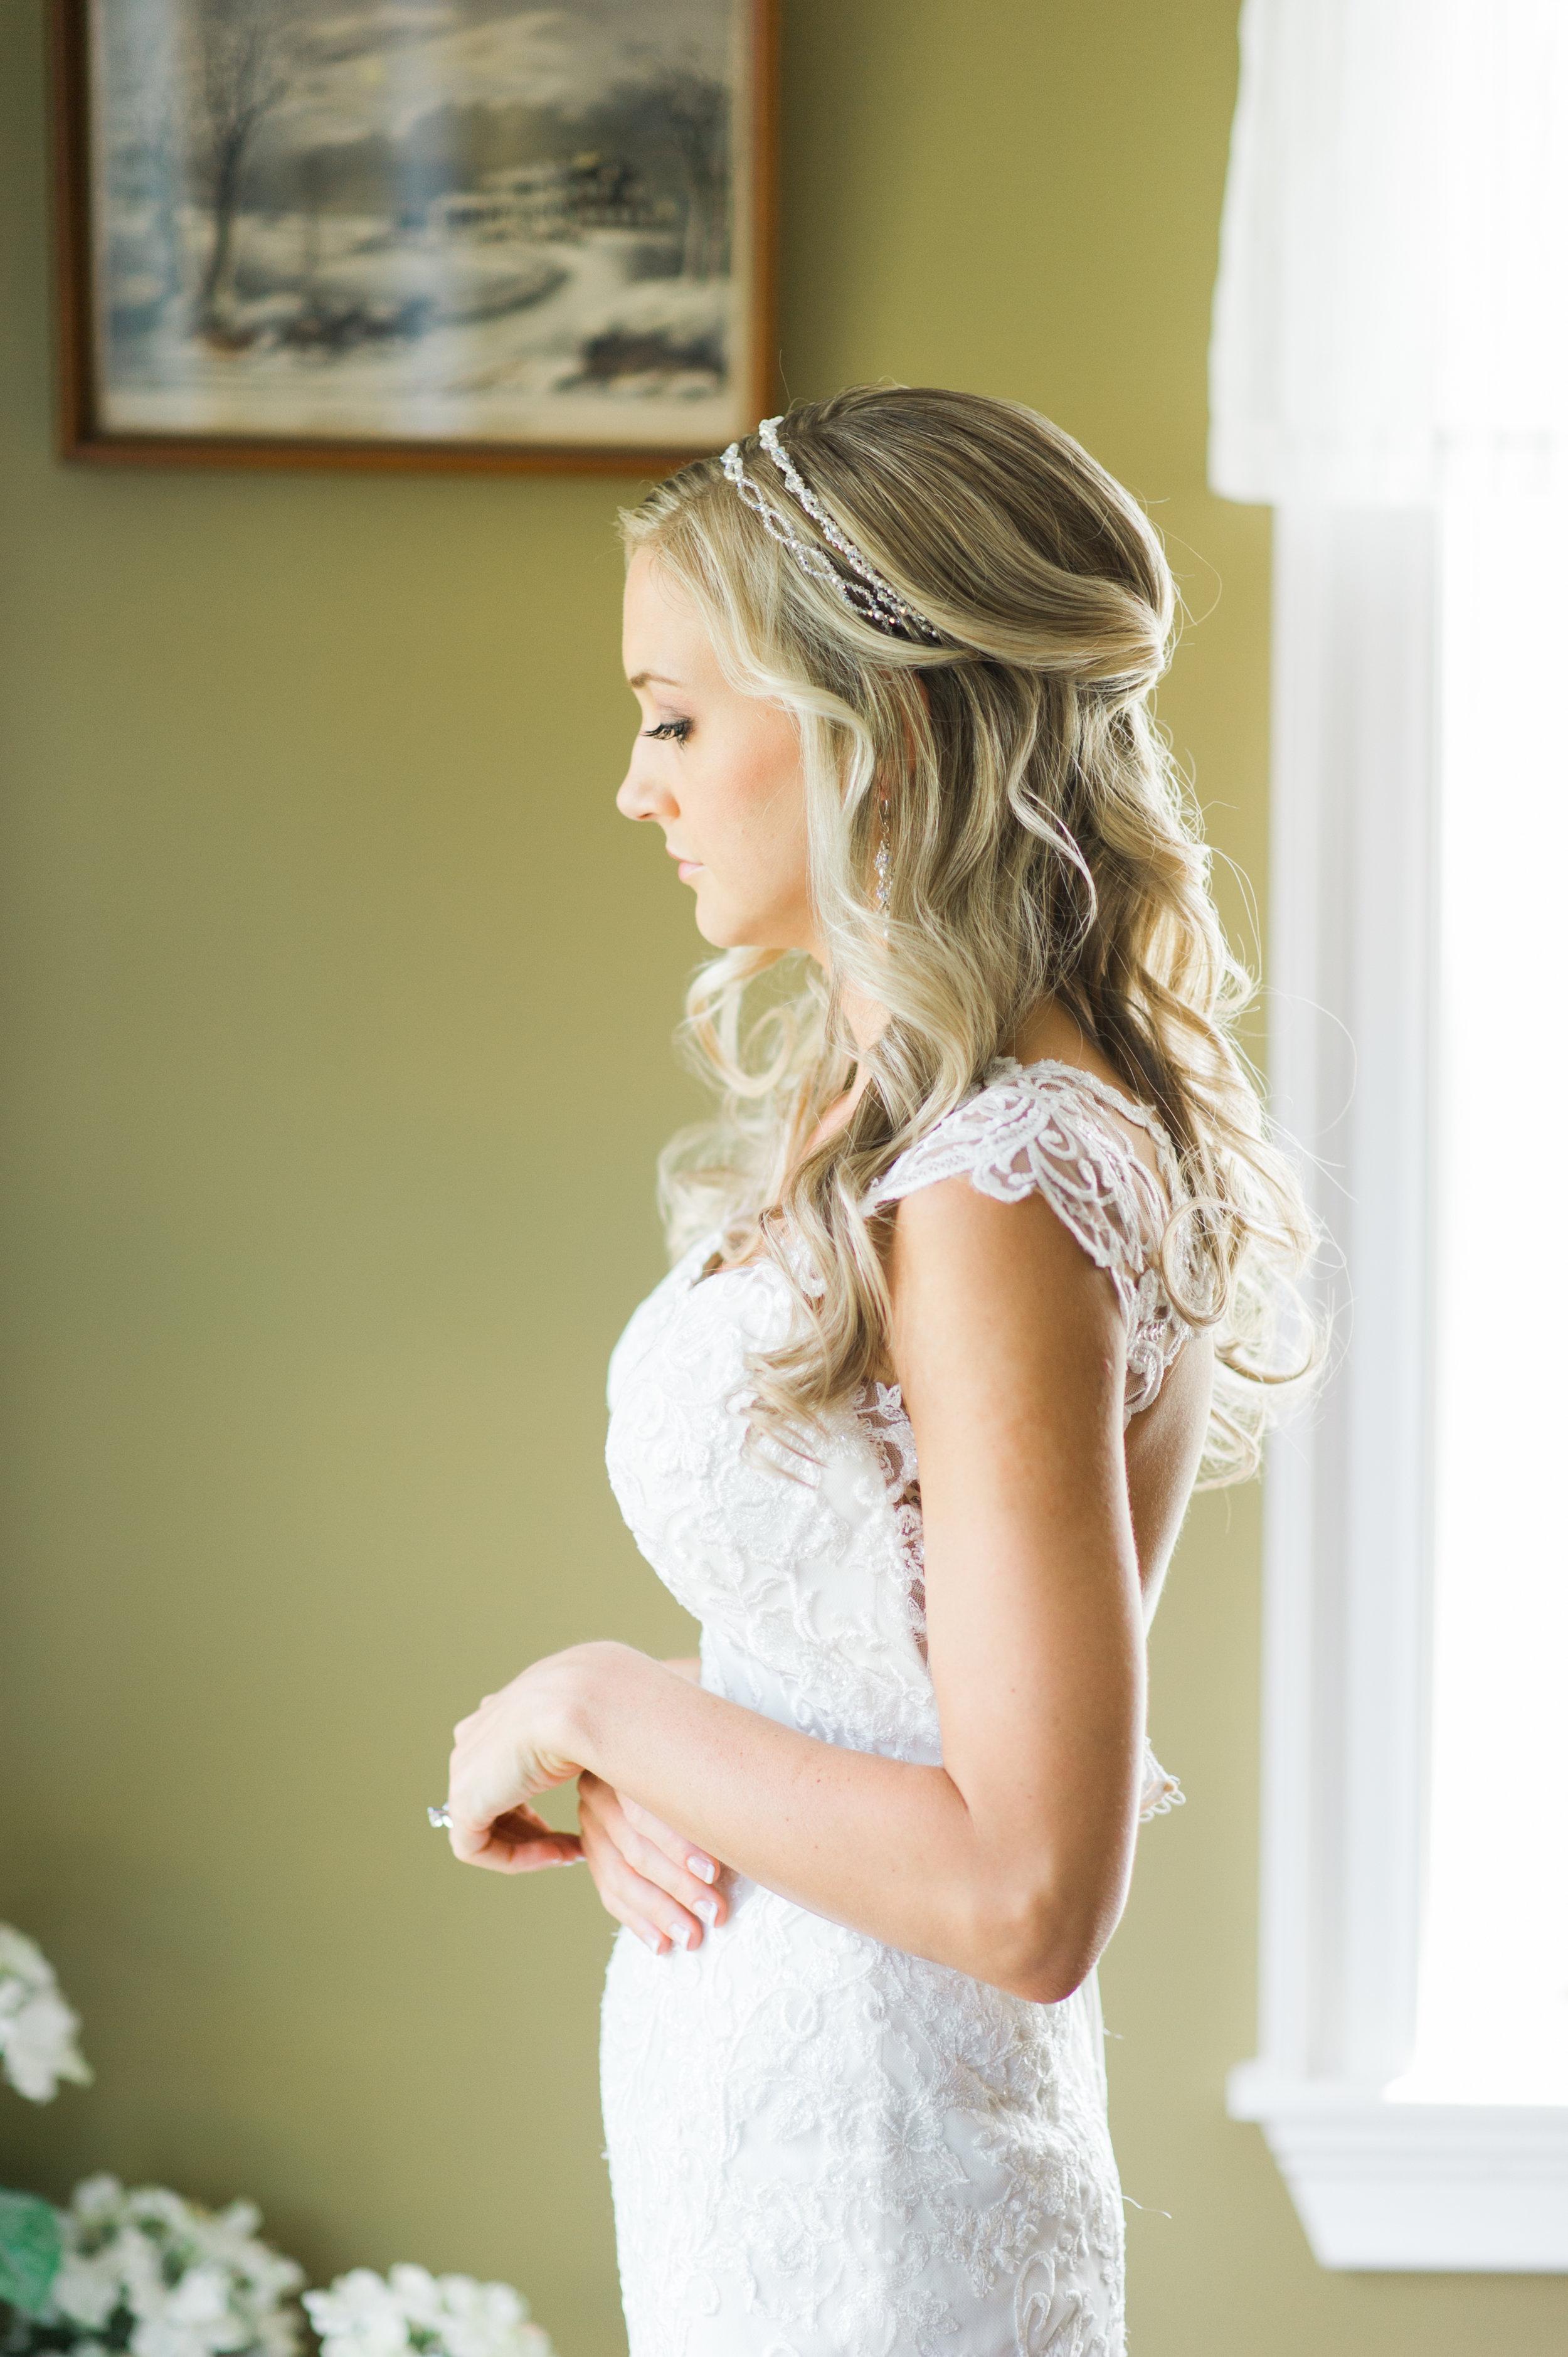 Leah Simpson JM SJ - Frozen In Time Photography-118.jpg